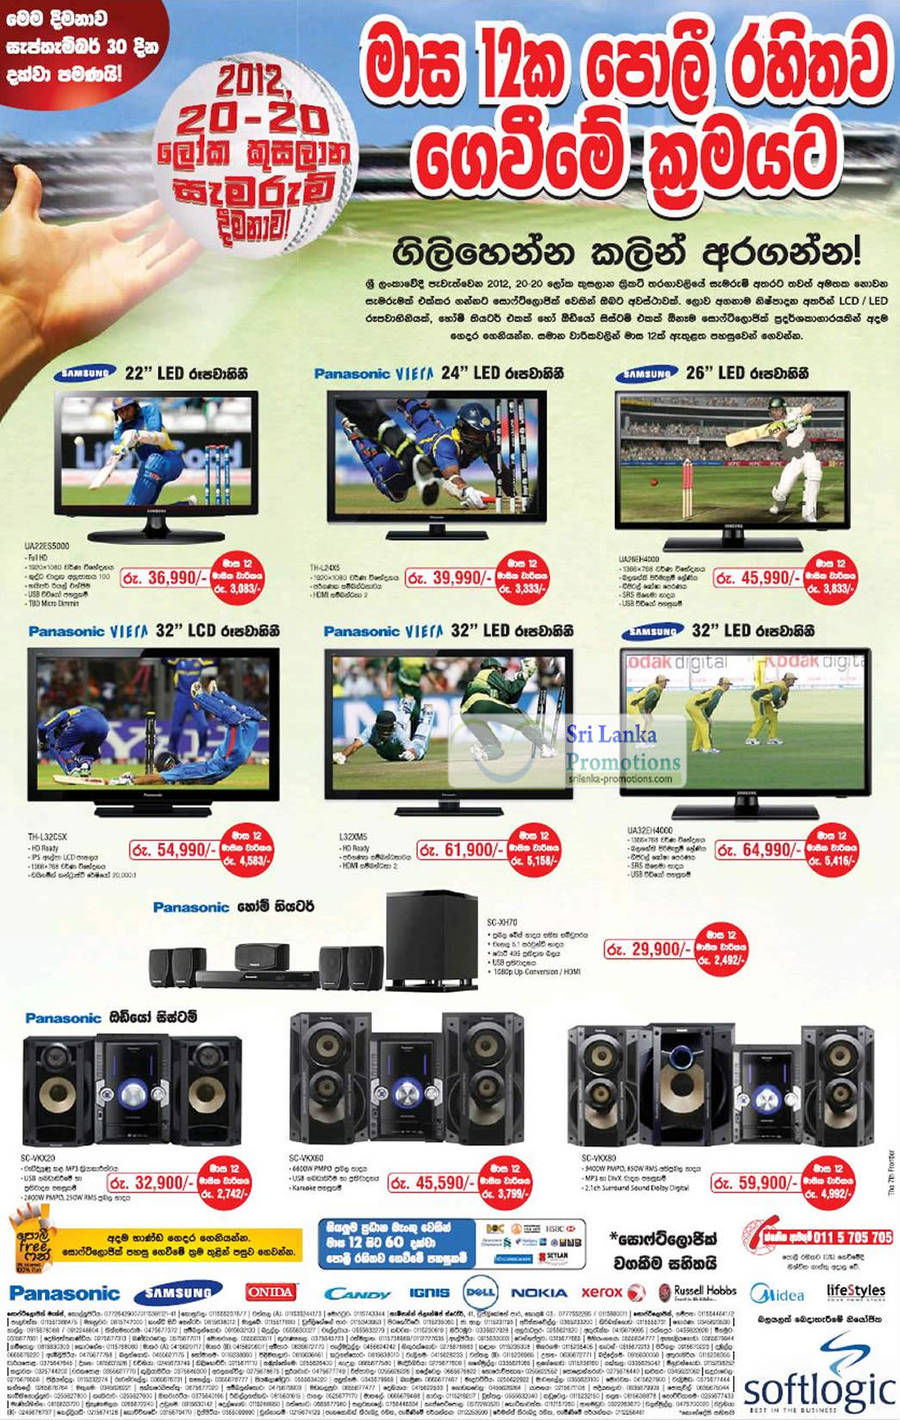 Samsung LED TV UA22ES5000, Panasonic Viera LED TV TH-L24X5, Samsung LED TV UA26EH4000, Samsung LED TV UA32EH4000, Panasonic Viera LED TV TH-L32XM5, Panasonic Viera TV TH-L32C5X, Panasonic Home Theatre SC-XH70, Panasonic HiFi System SC-VKX20, Panasonic HiFi System SC-VKX60, Panasonic HiFi System SC-VKX80